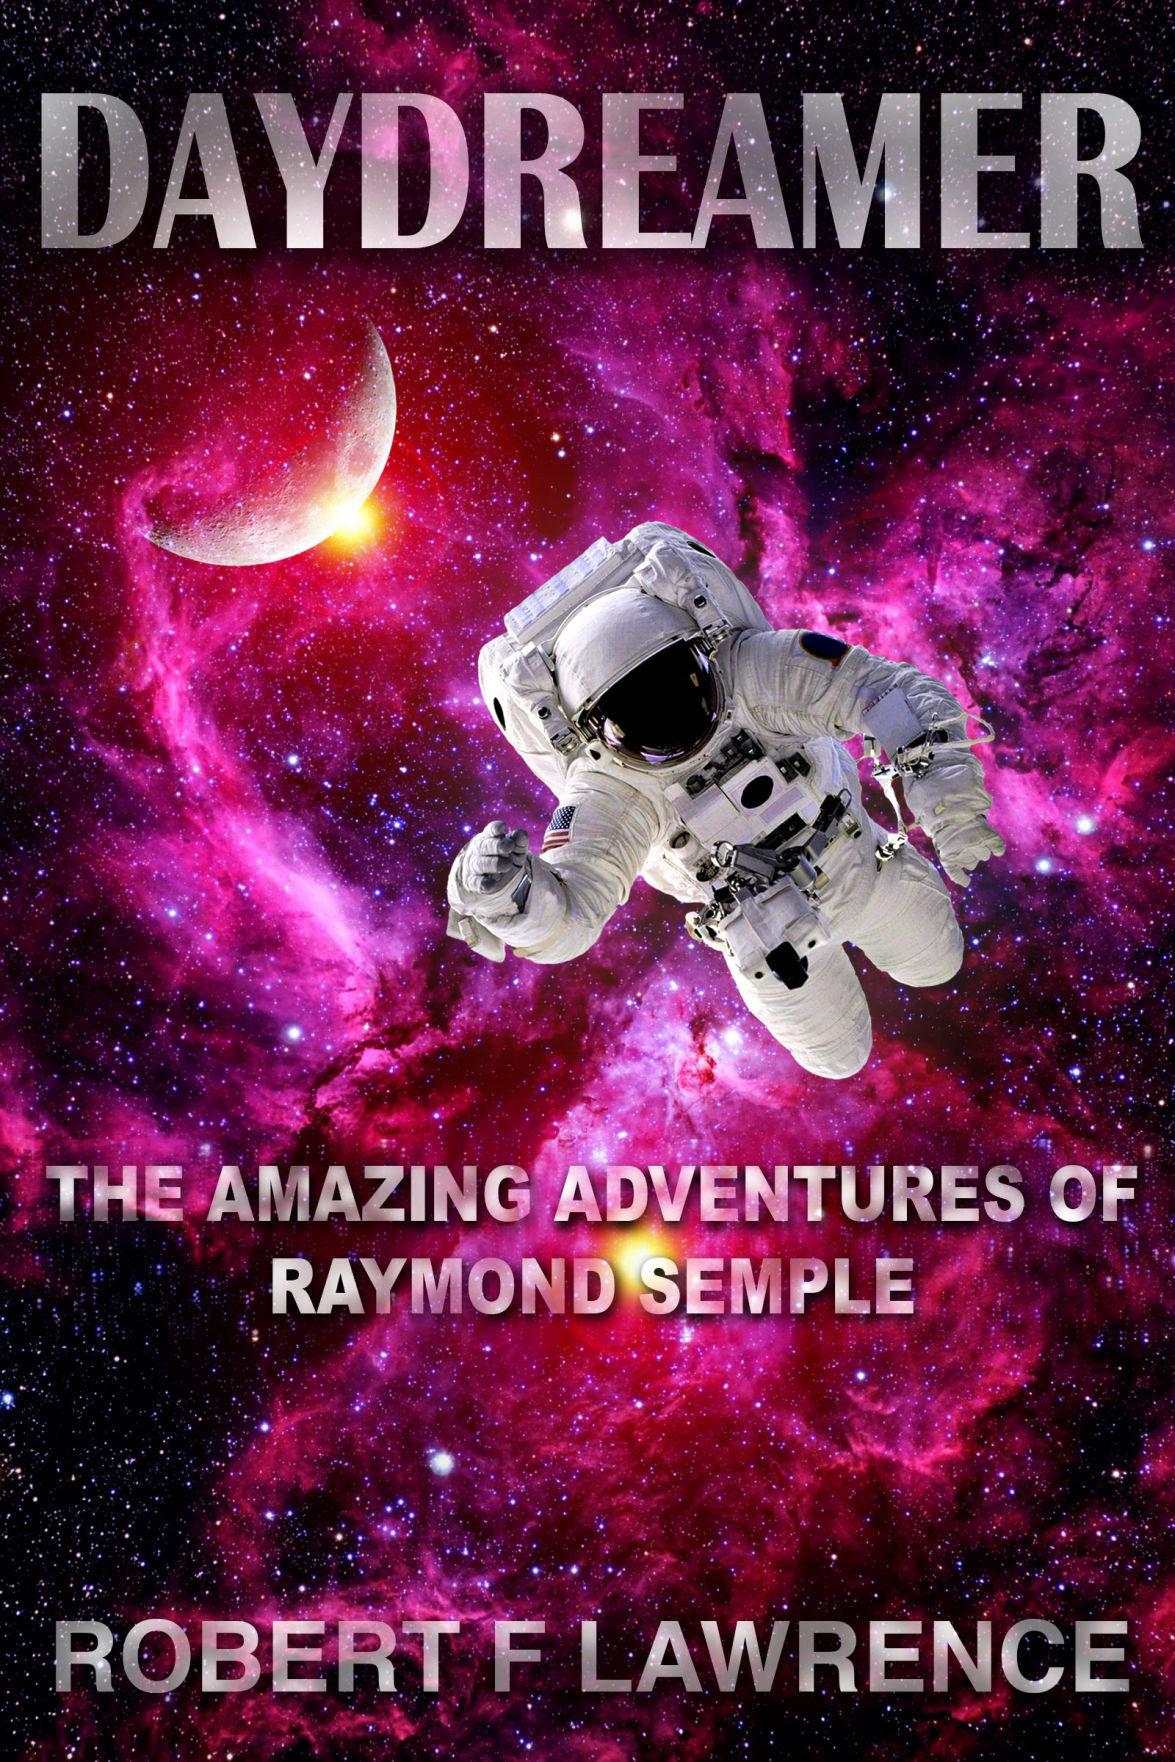 daydreamer book cover